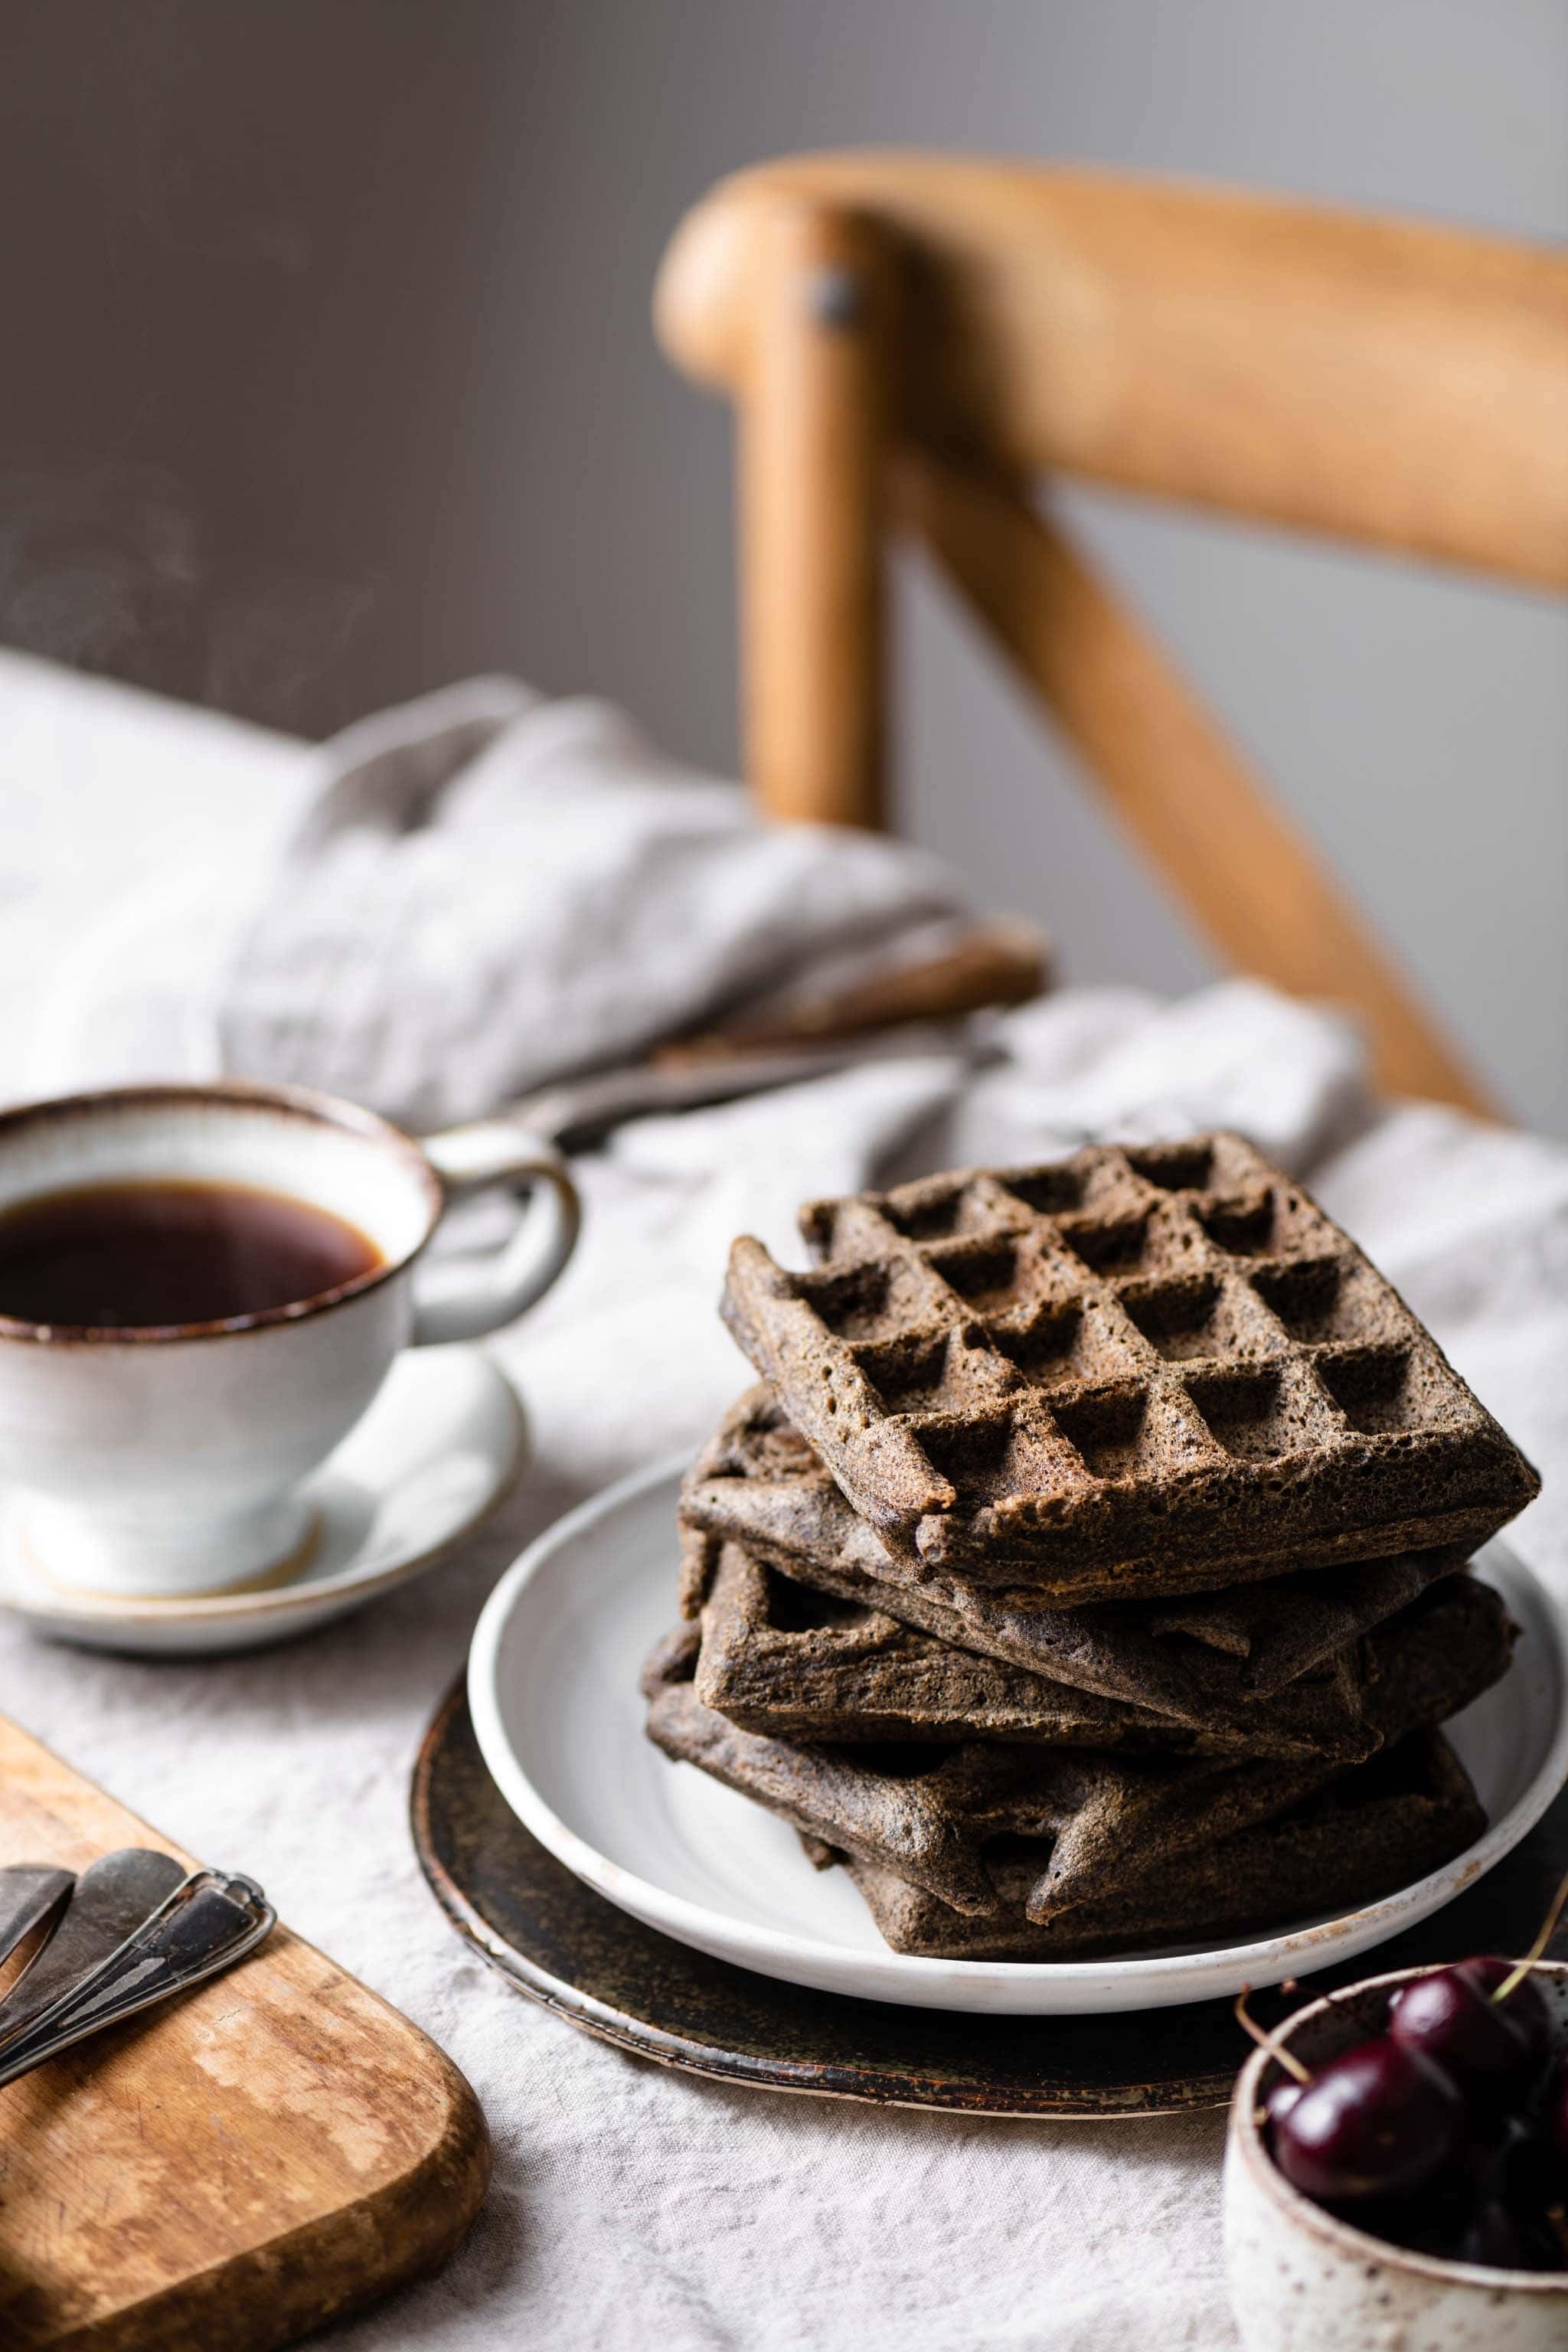 Gluten Free Buckwheat Waffles and Coffee for breakfast